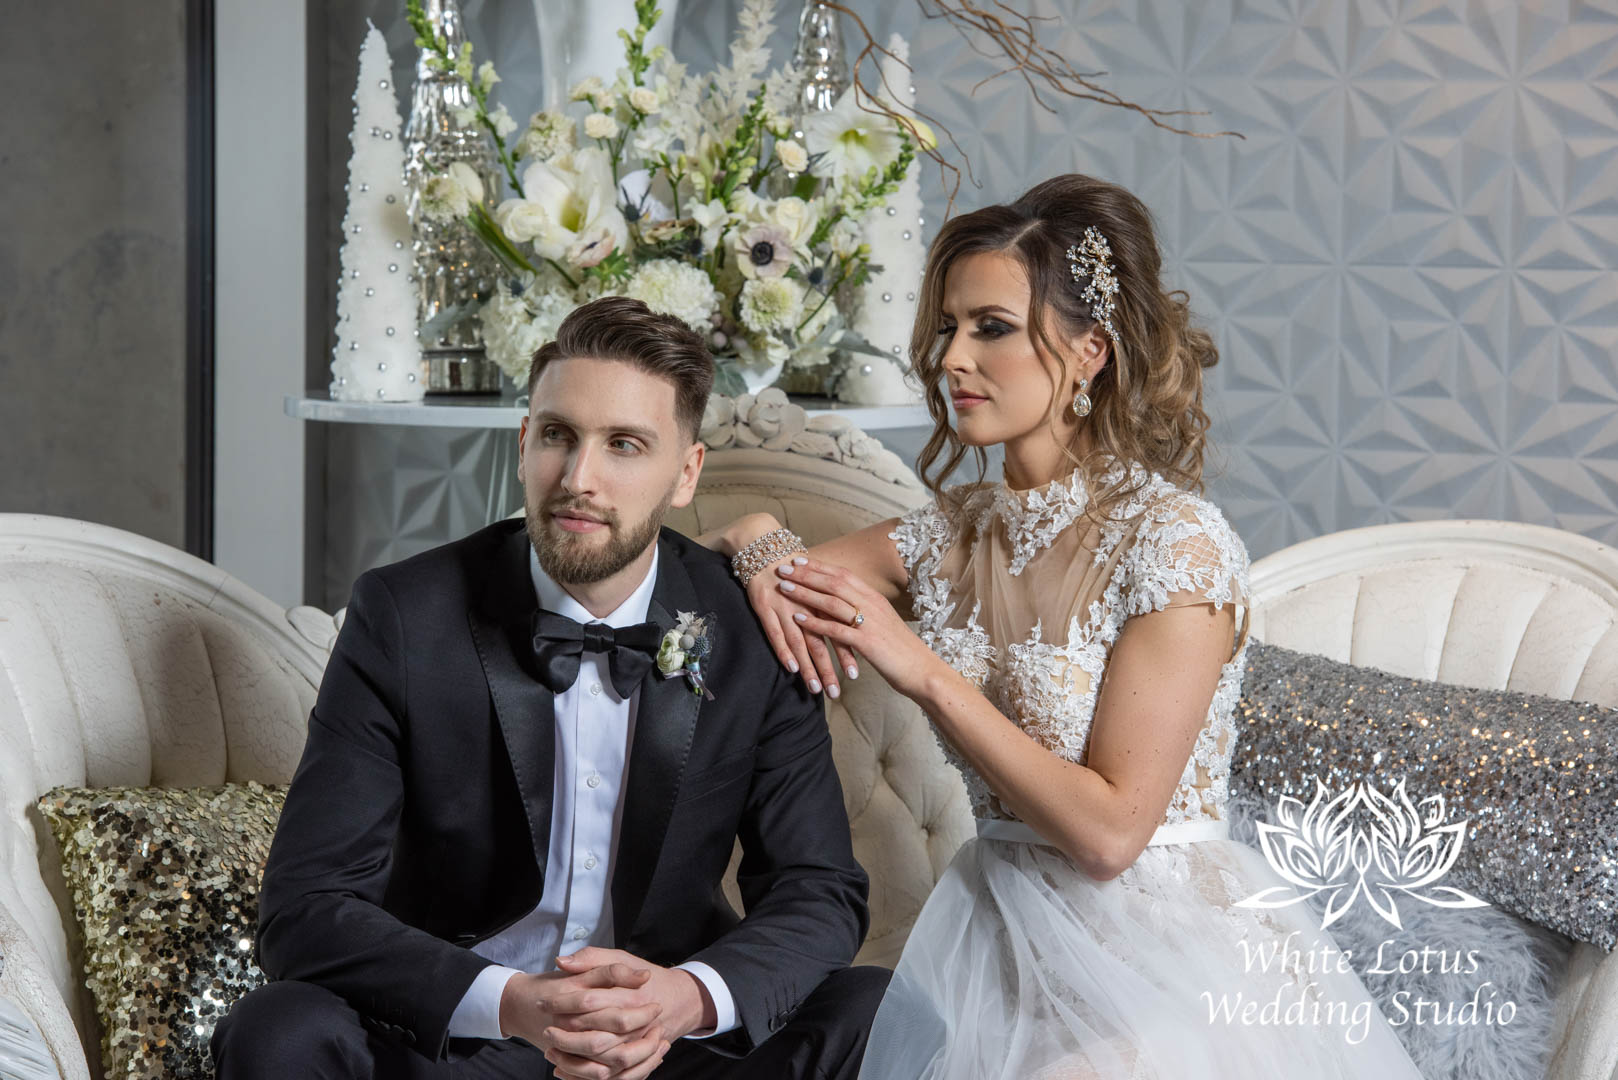 074- GLAM WINTERLUXE WEDDING INSPIRATION